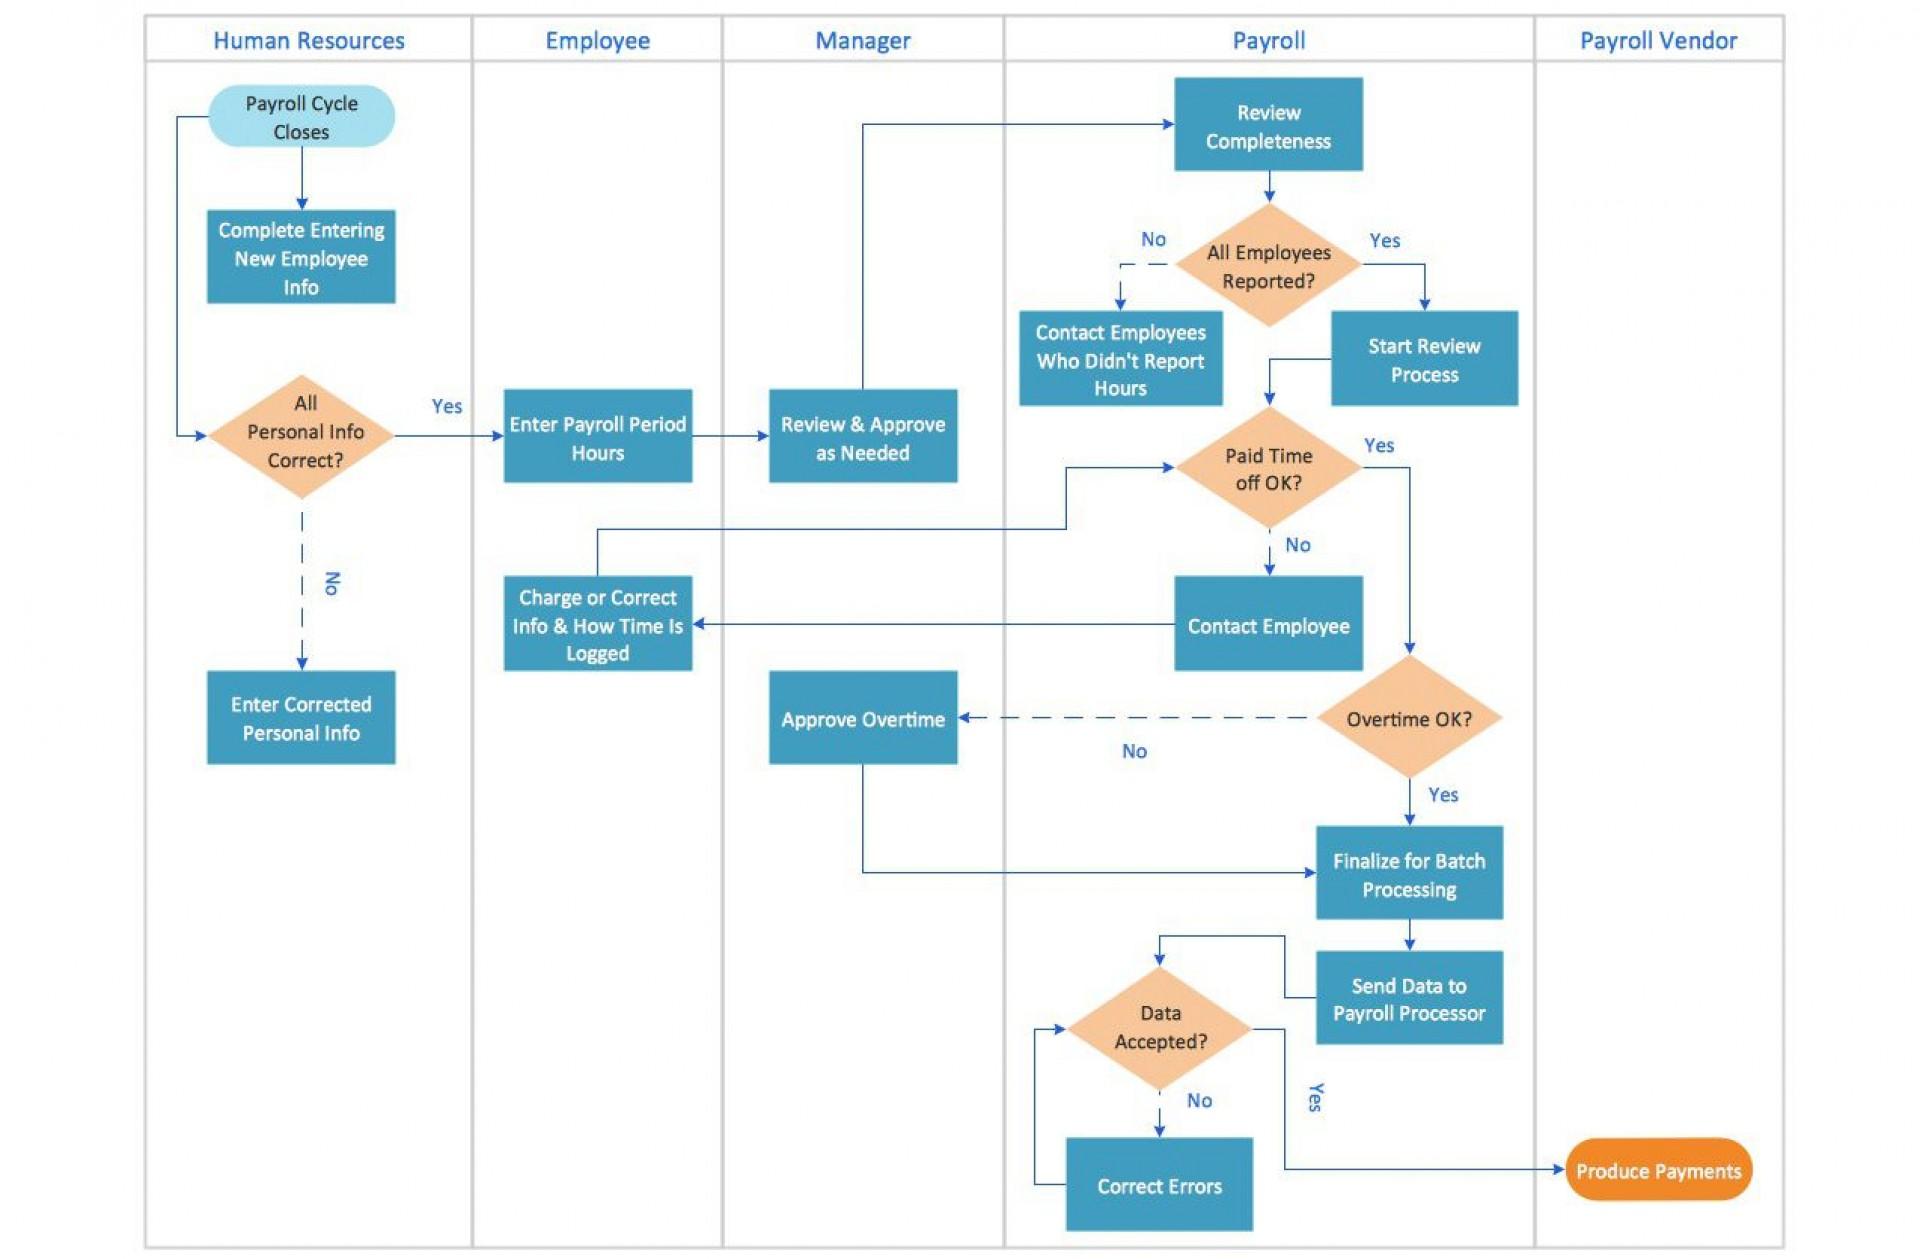 000 Singular Proces Flow Chart Template Xl Image  Free Manufacturing1920